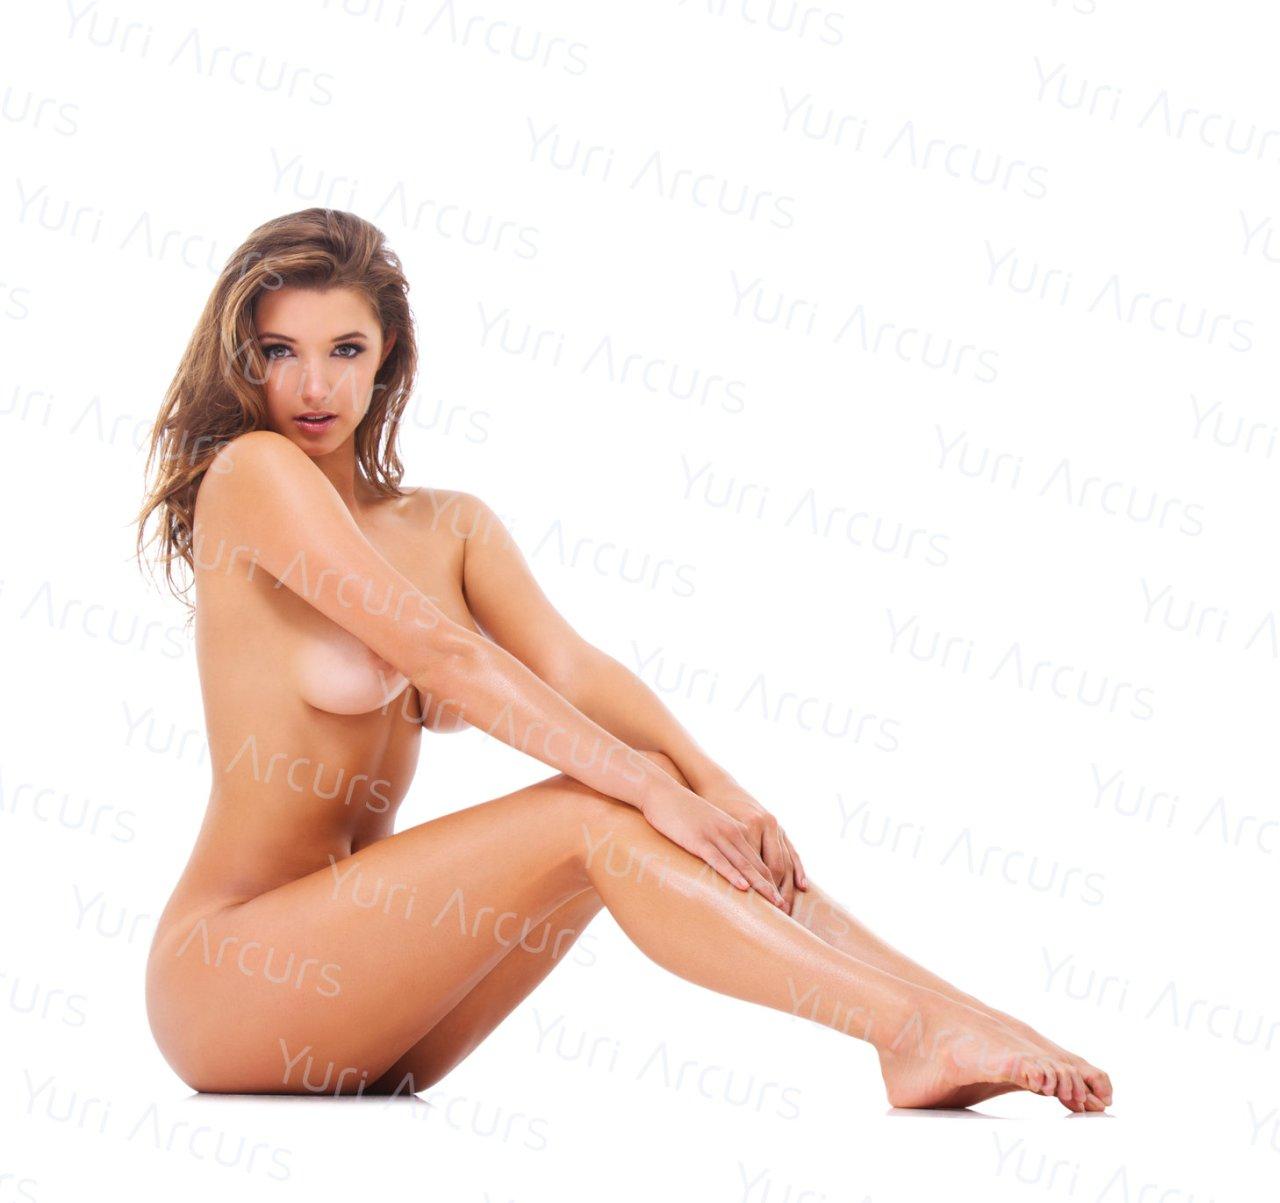 Alyssa Arce Desnuda alyssa arce nakedmissa fake nude | joss picture cam